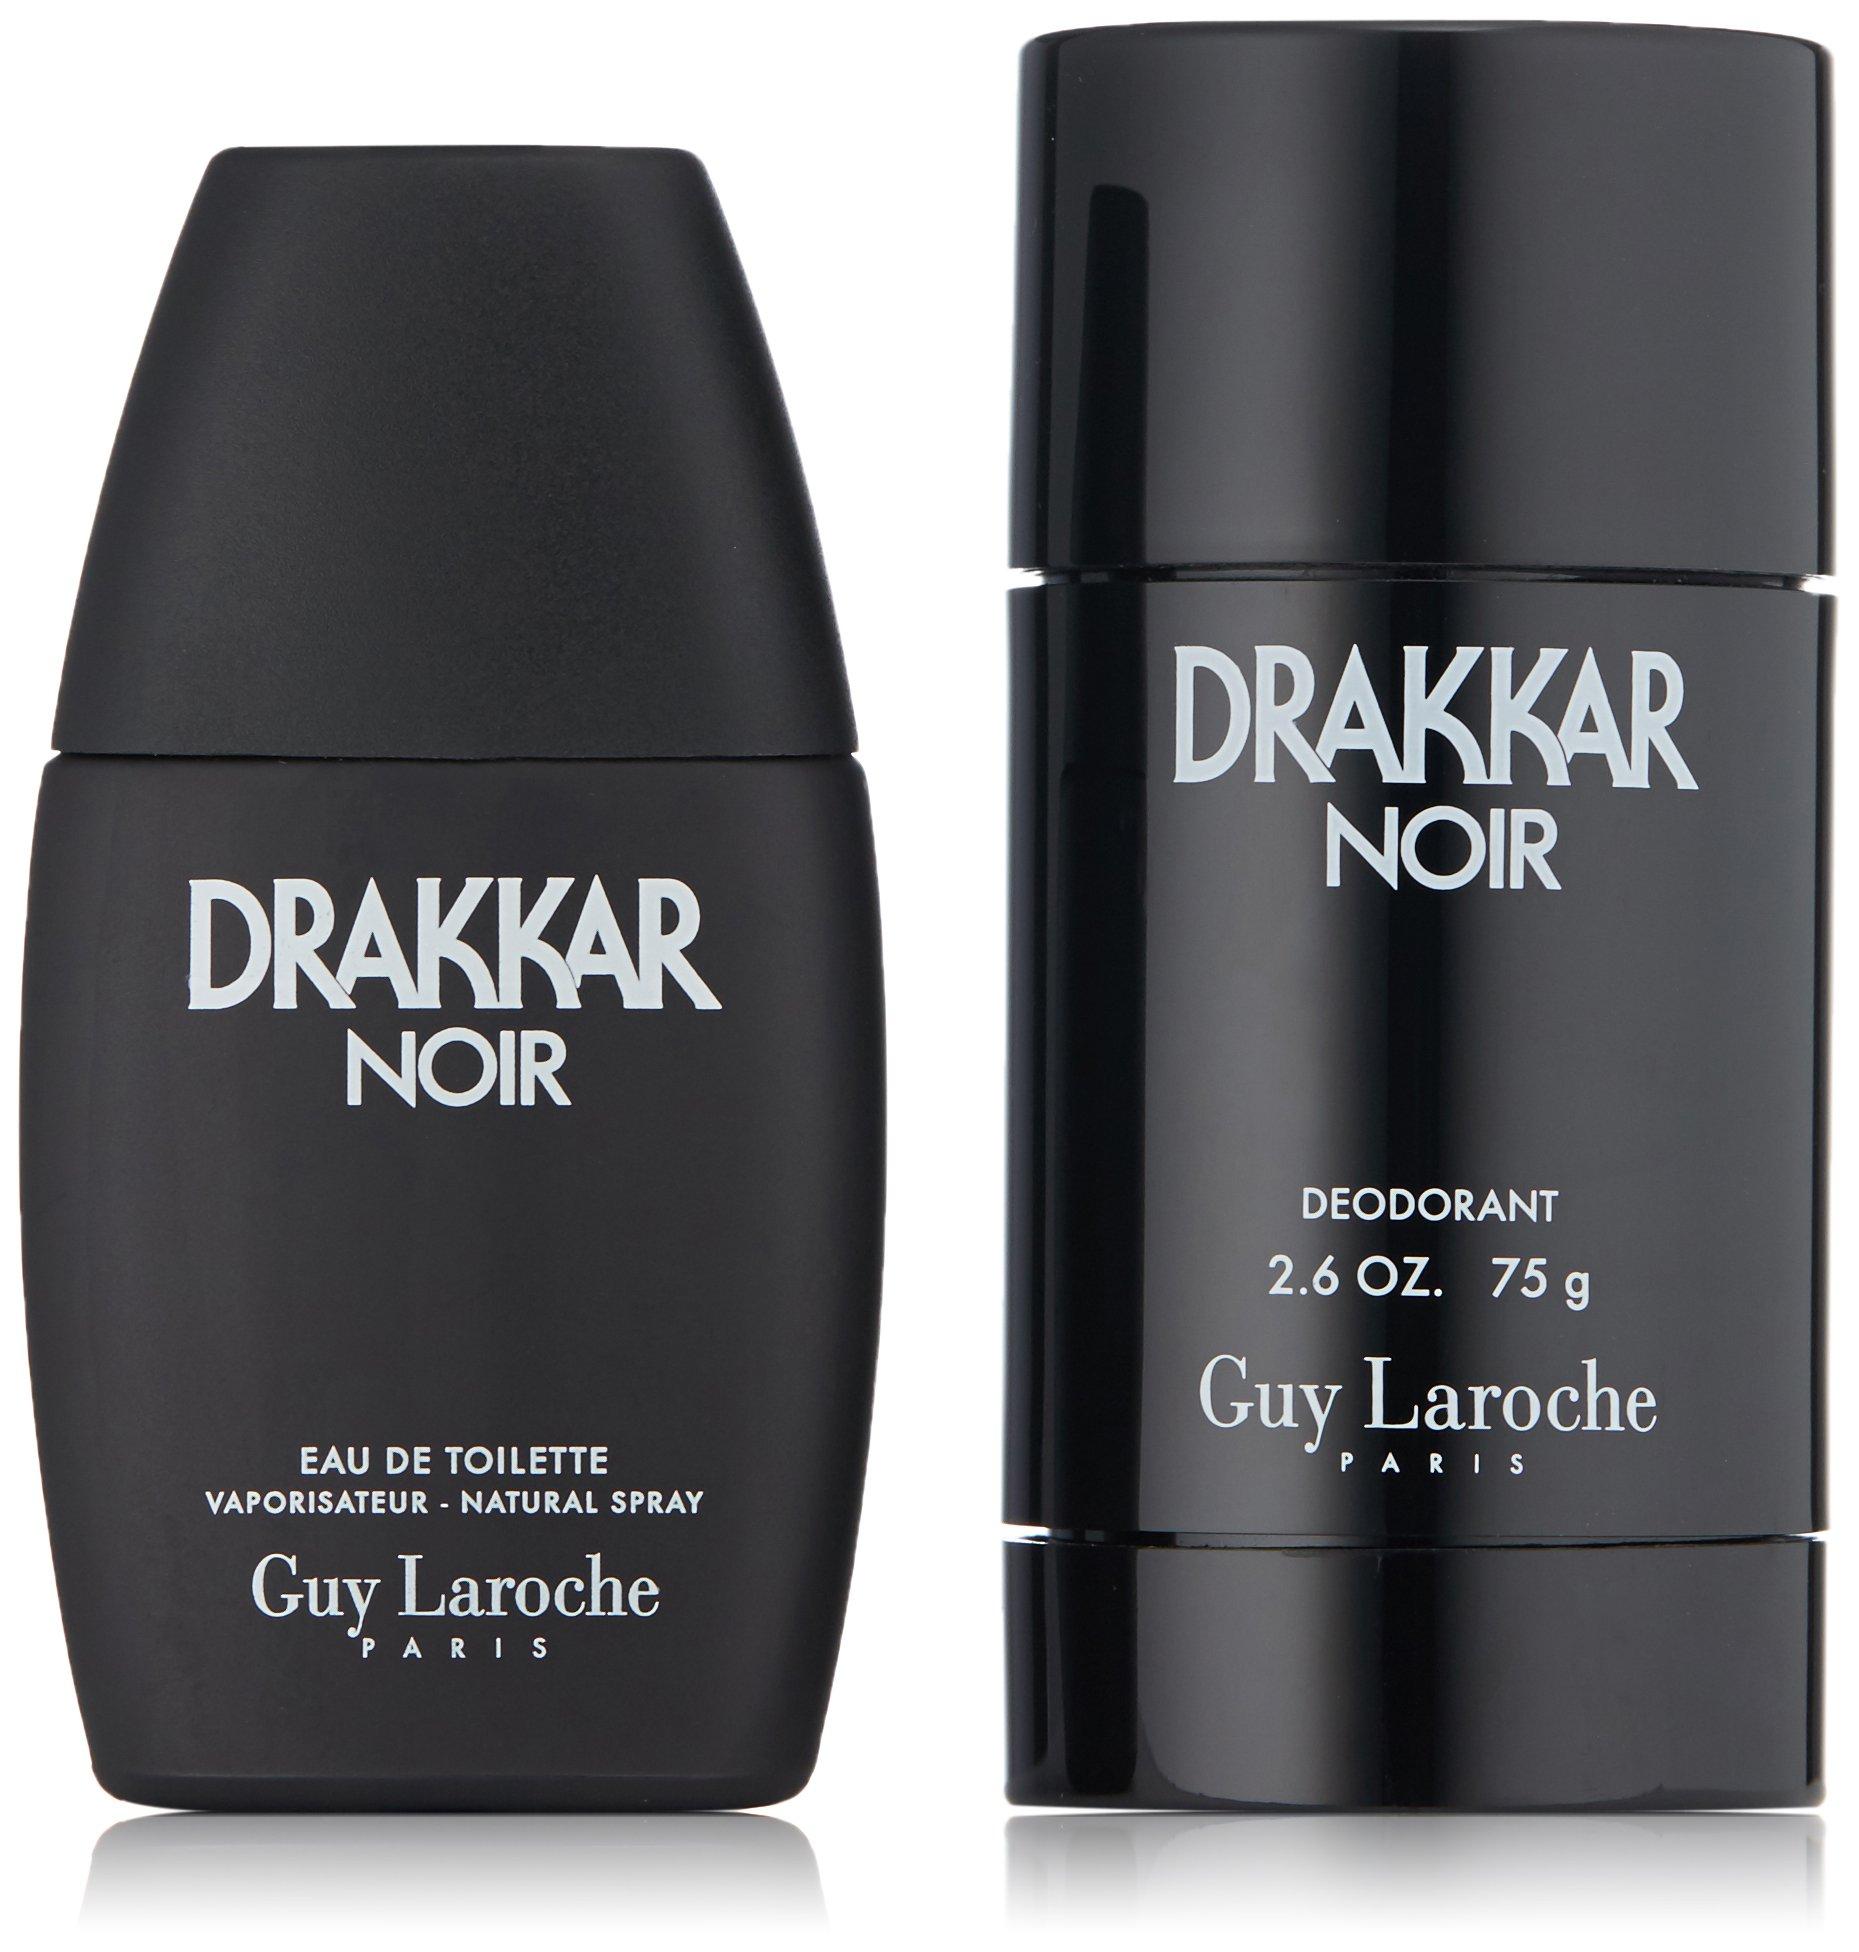 Guy Laroche Drakkar Noir Eau de Toilette Spray 1.0 Fl Oz and Deodorant Stick Gift Set